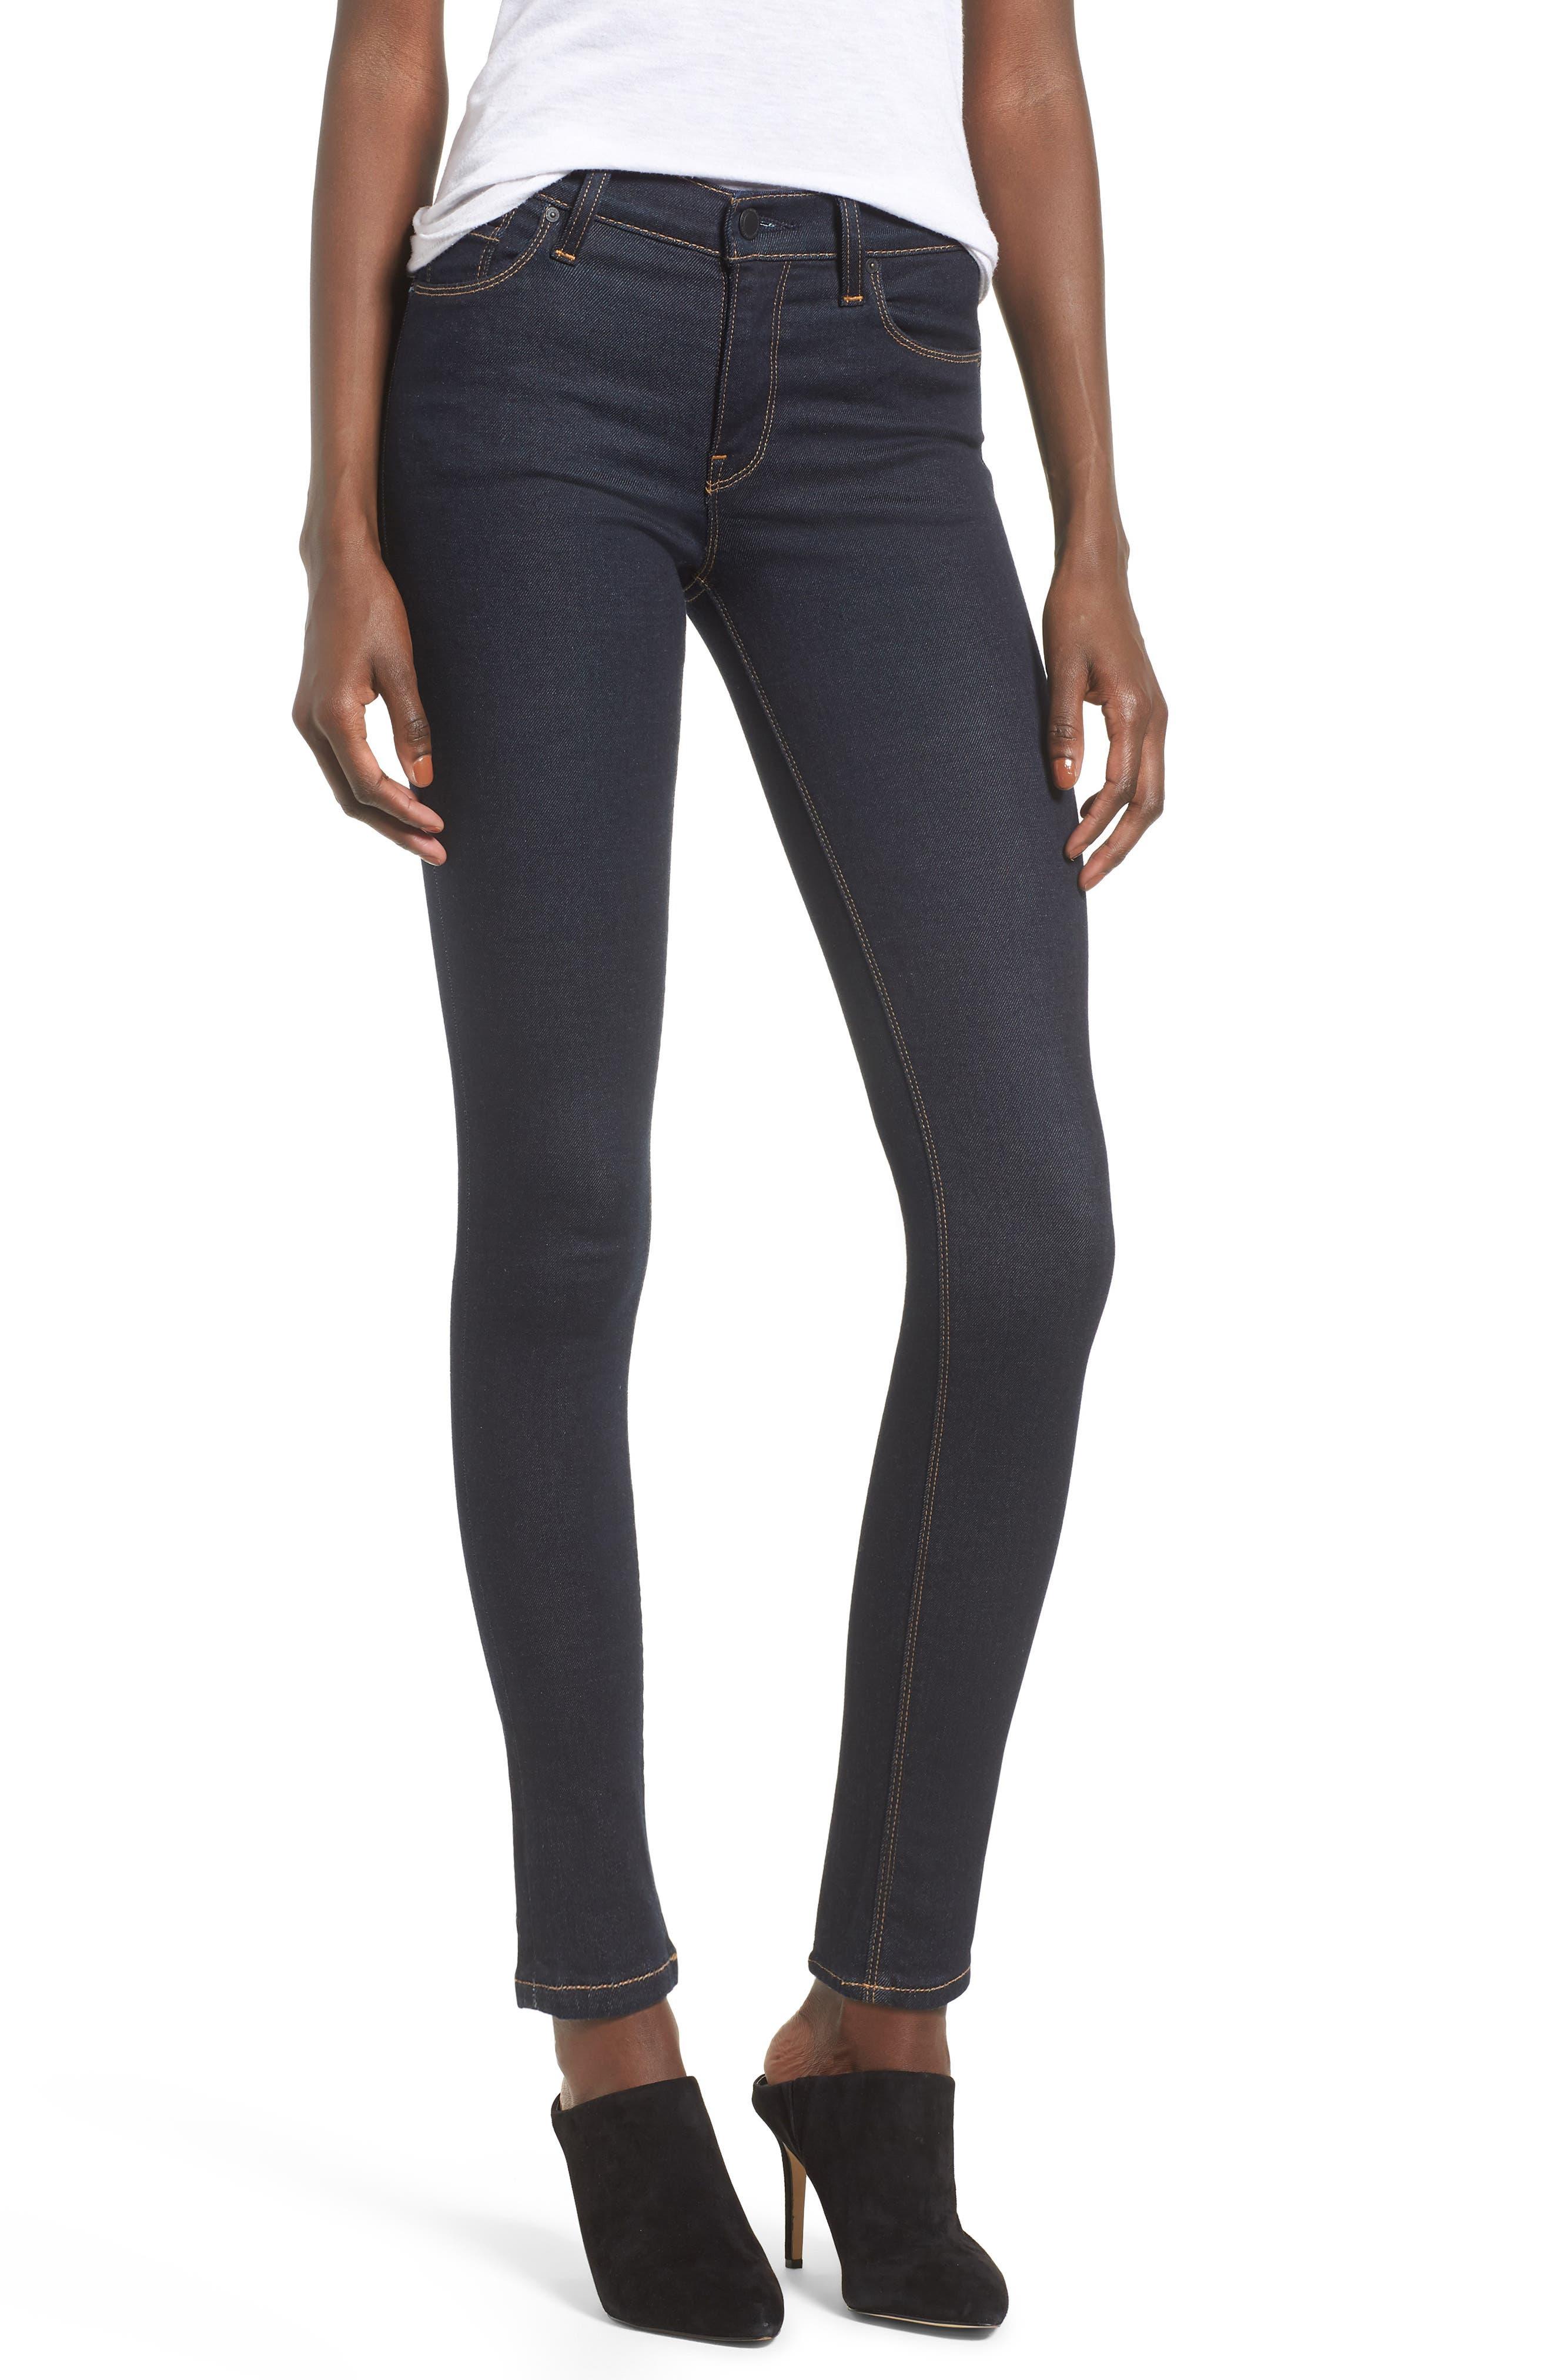 Nico Super Skinny Jeans,                             Main thumbnail 1, color,                             SUNSET BLVD